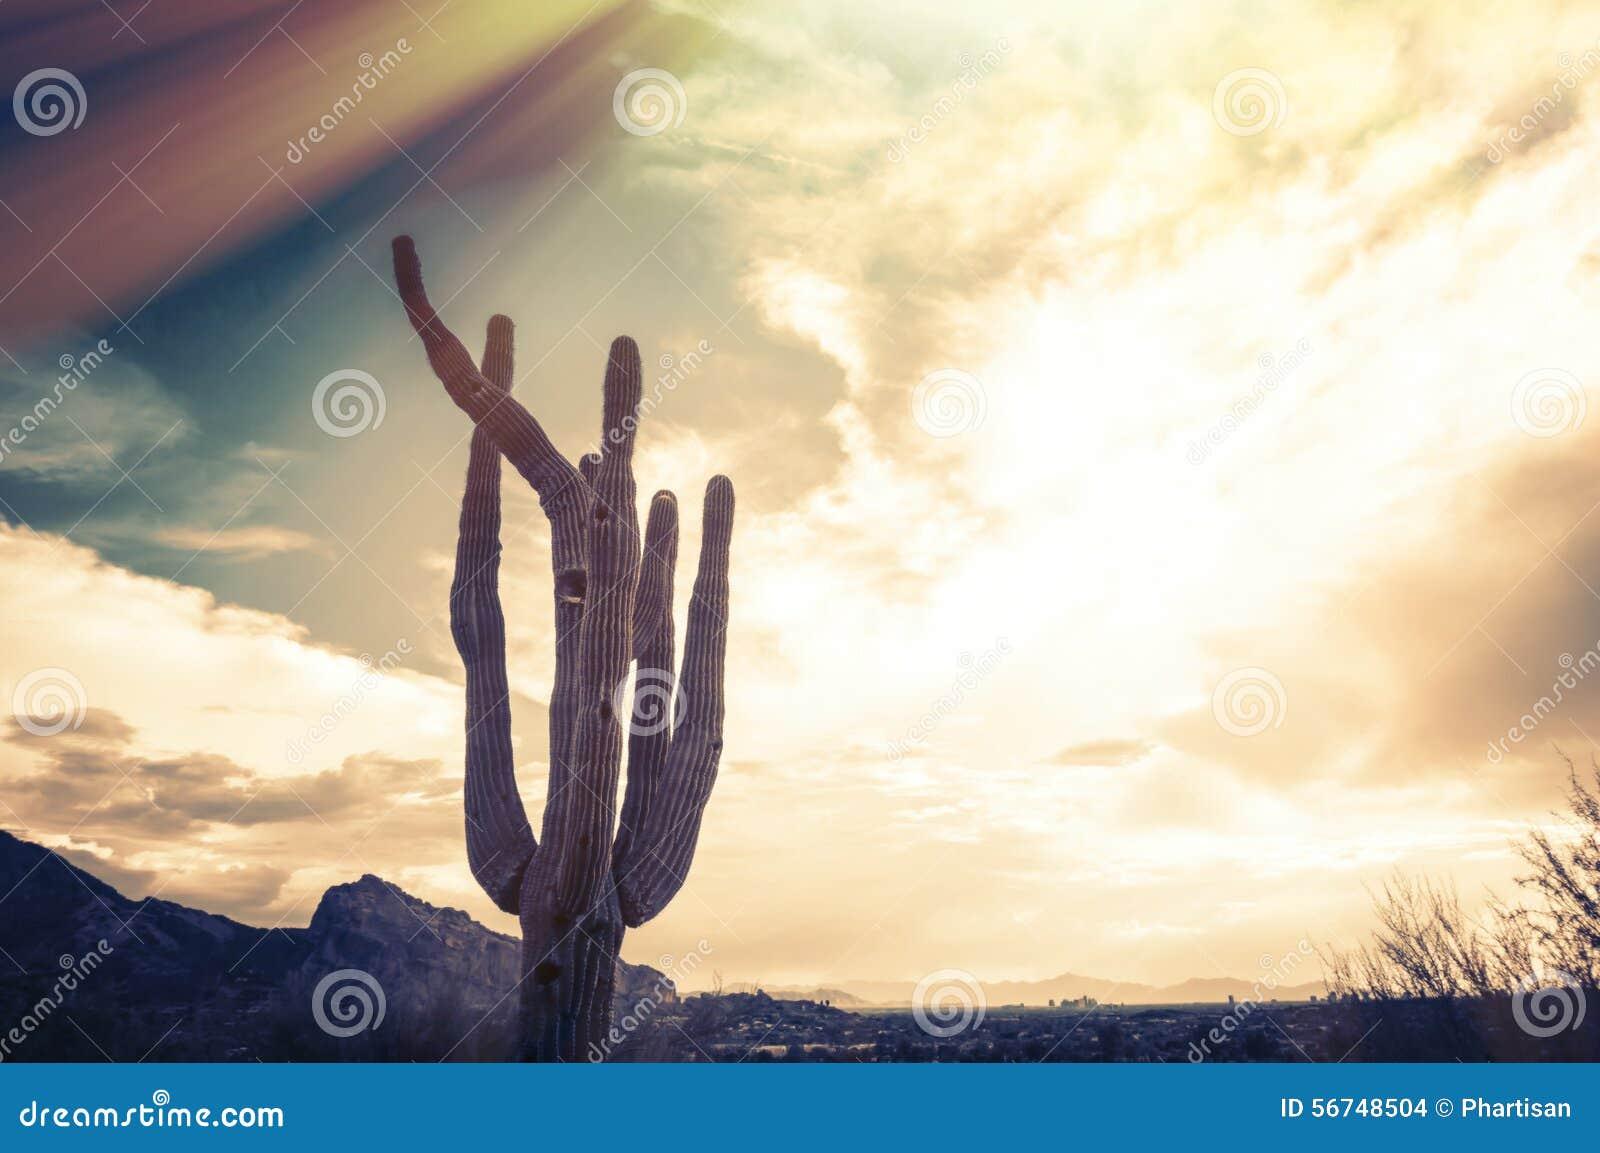 Saguaro Cactus tree - Camelback Mountain, Phoenix,AZ